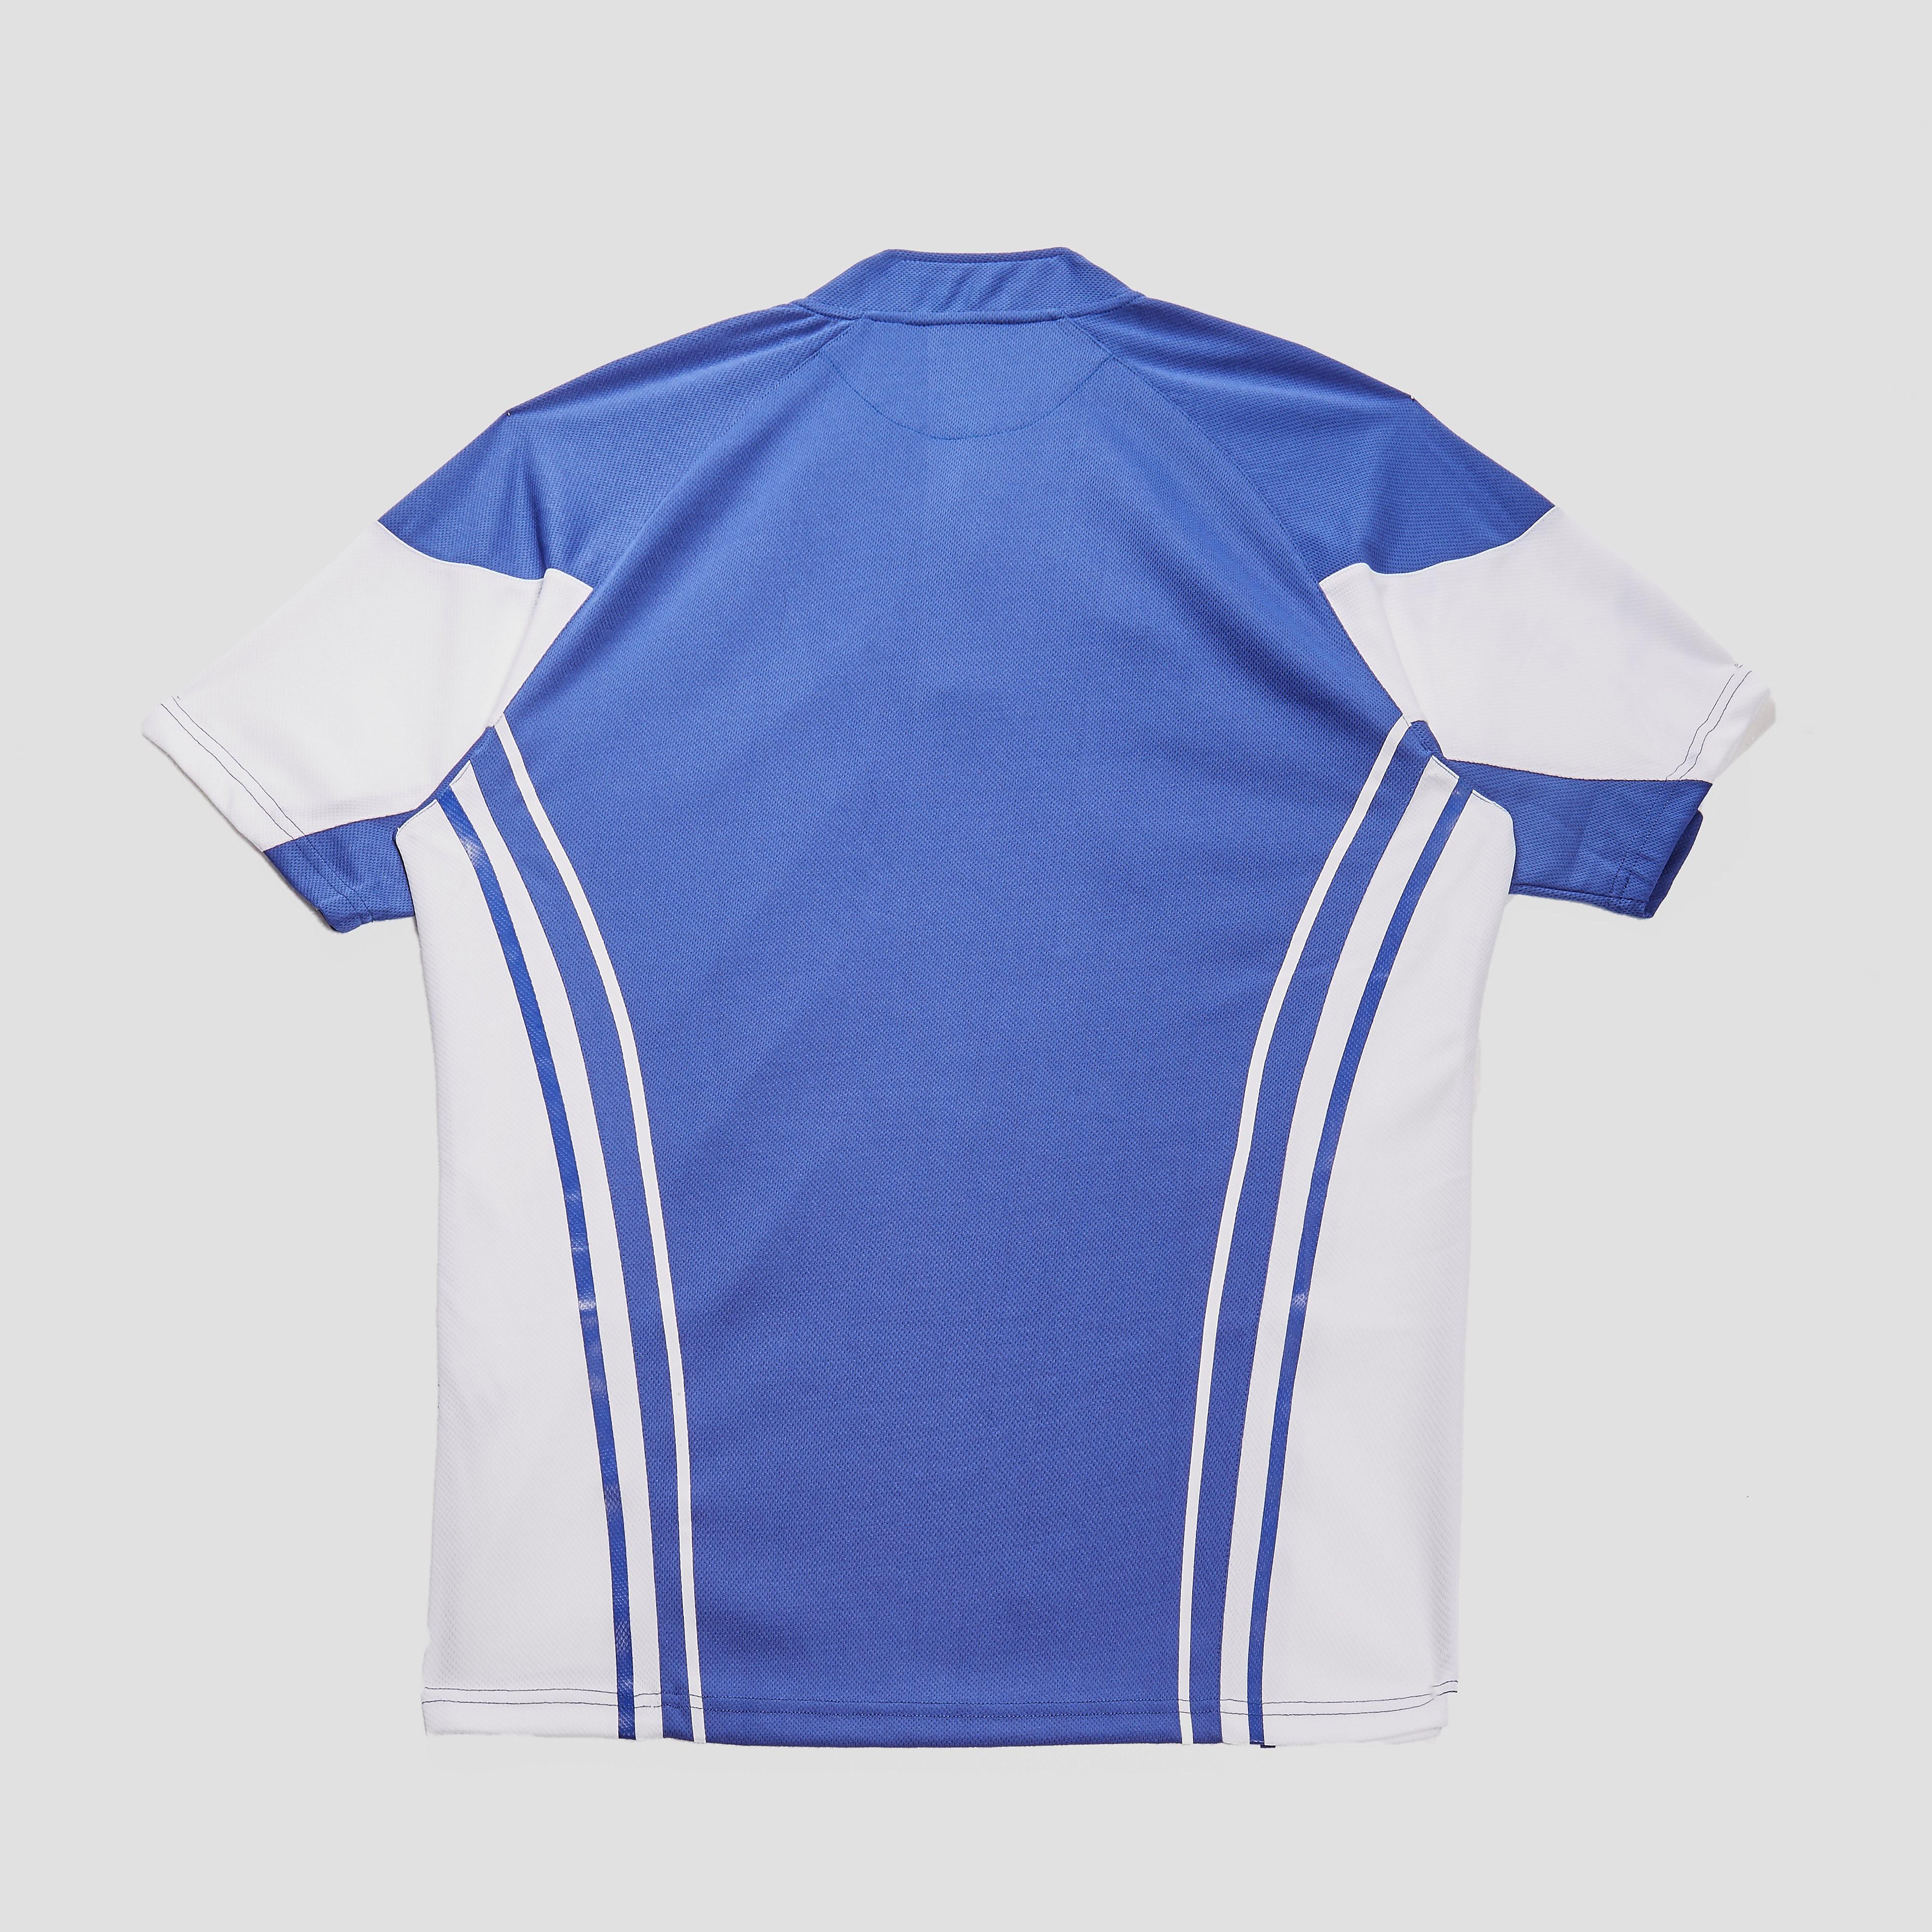 KooGa Stadium Match Men's Rugby Shirt